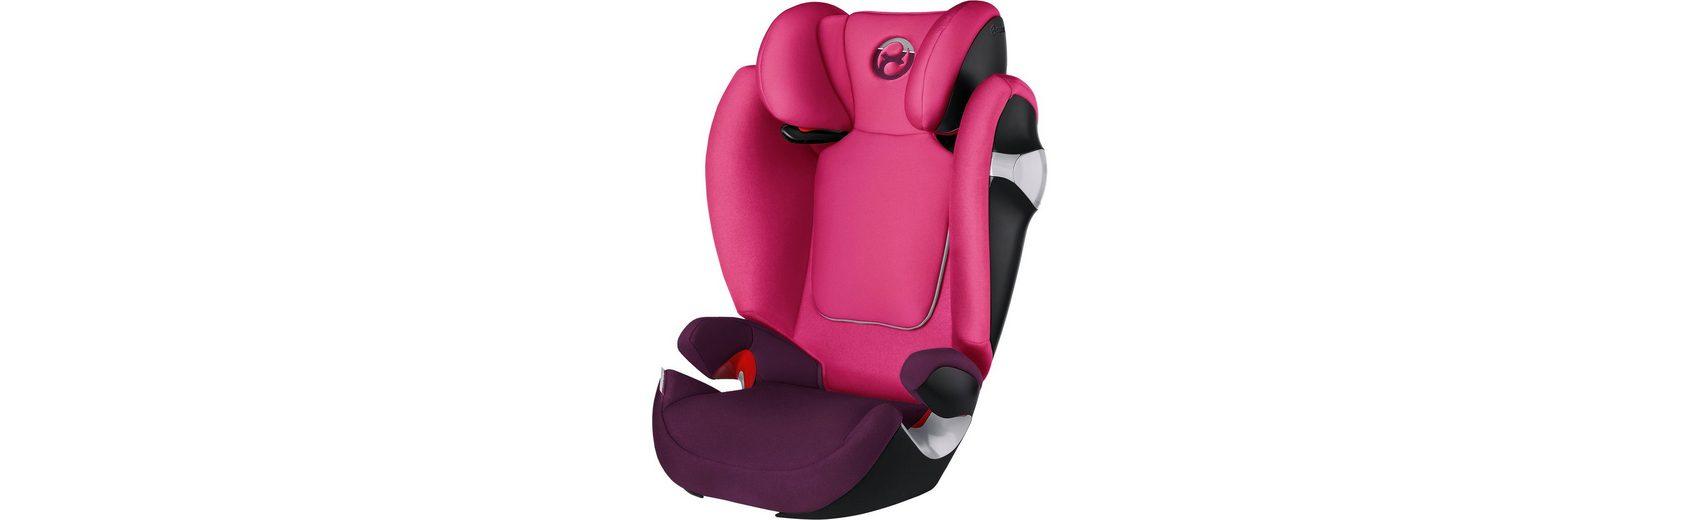 Cybex Auto-Kindersitz Solution M, Gold-Line, Mystic Pink-Purple, 2